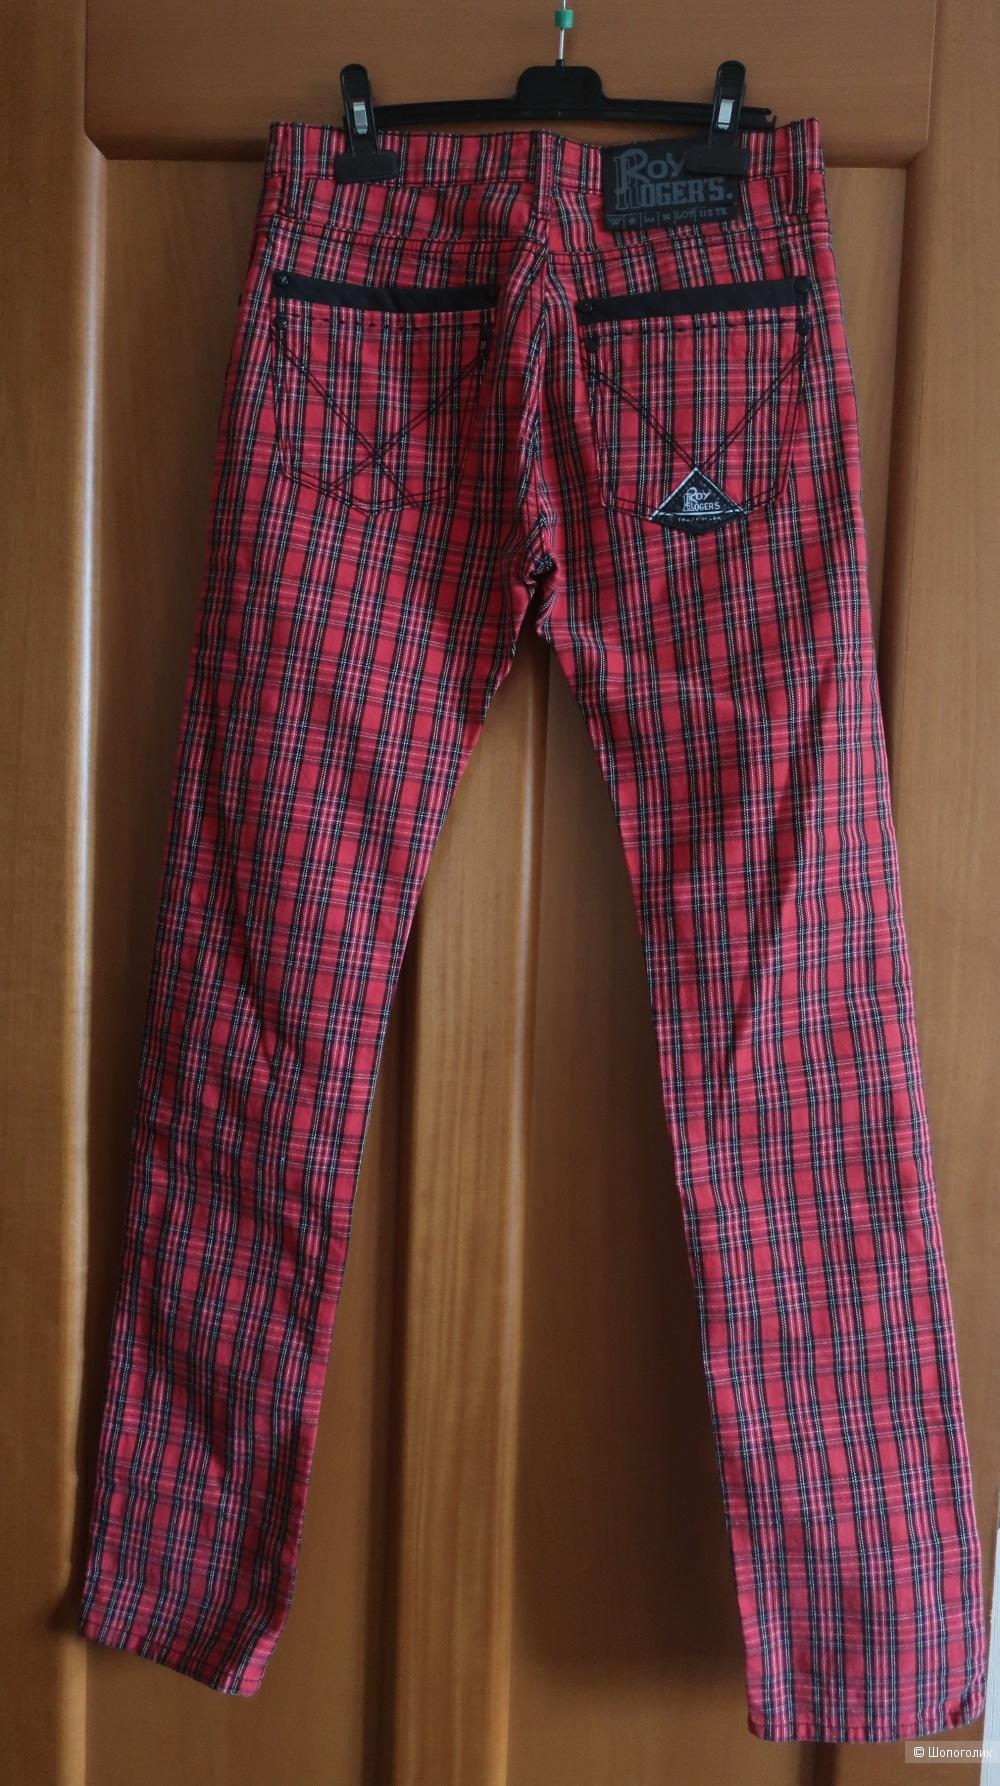 ROŸ roger'S, брюки, размер 36EU/16 лет